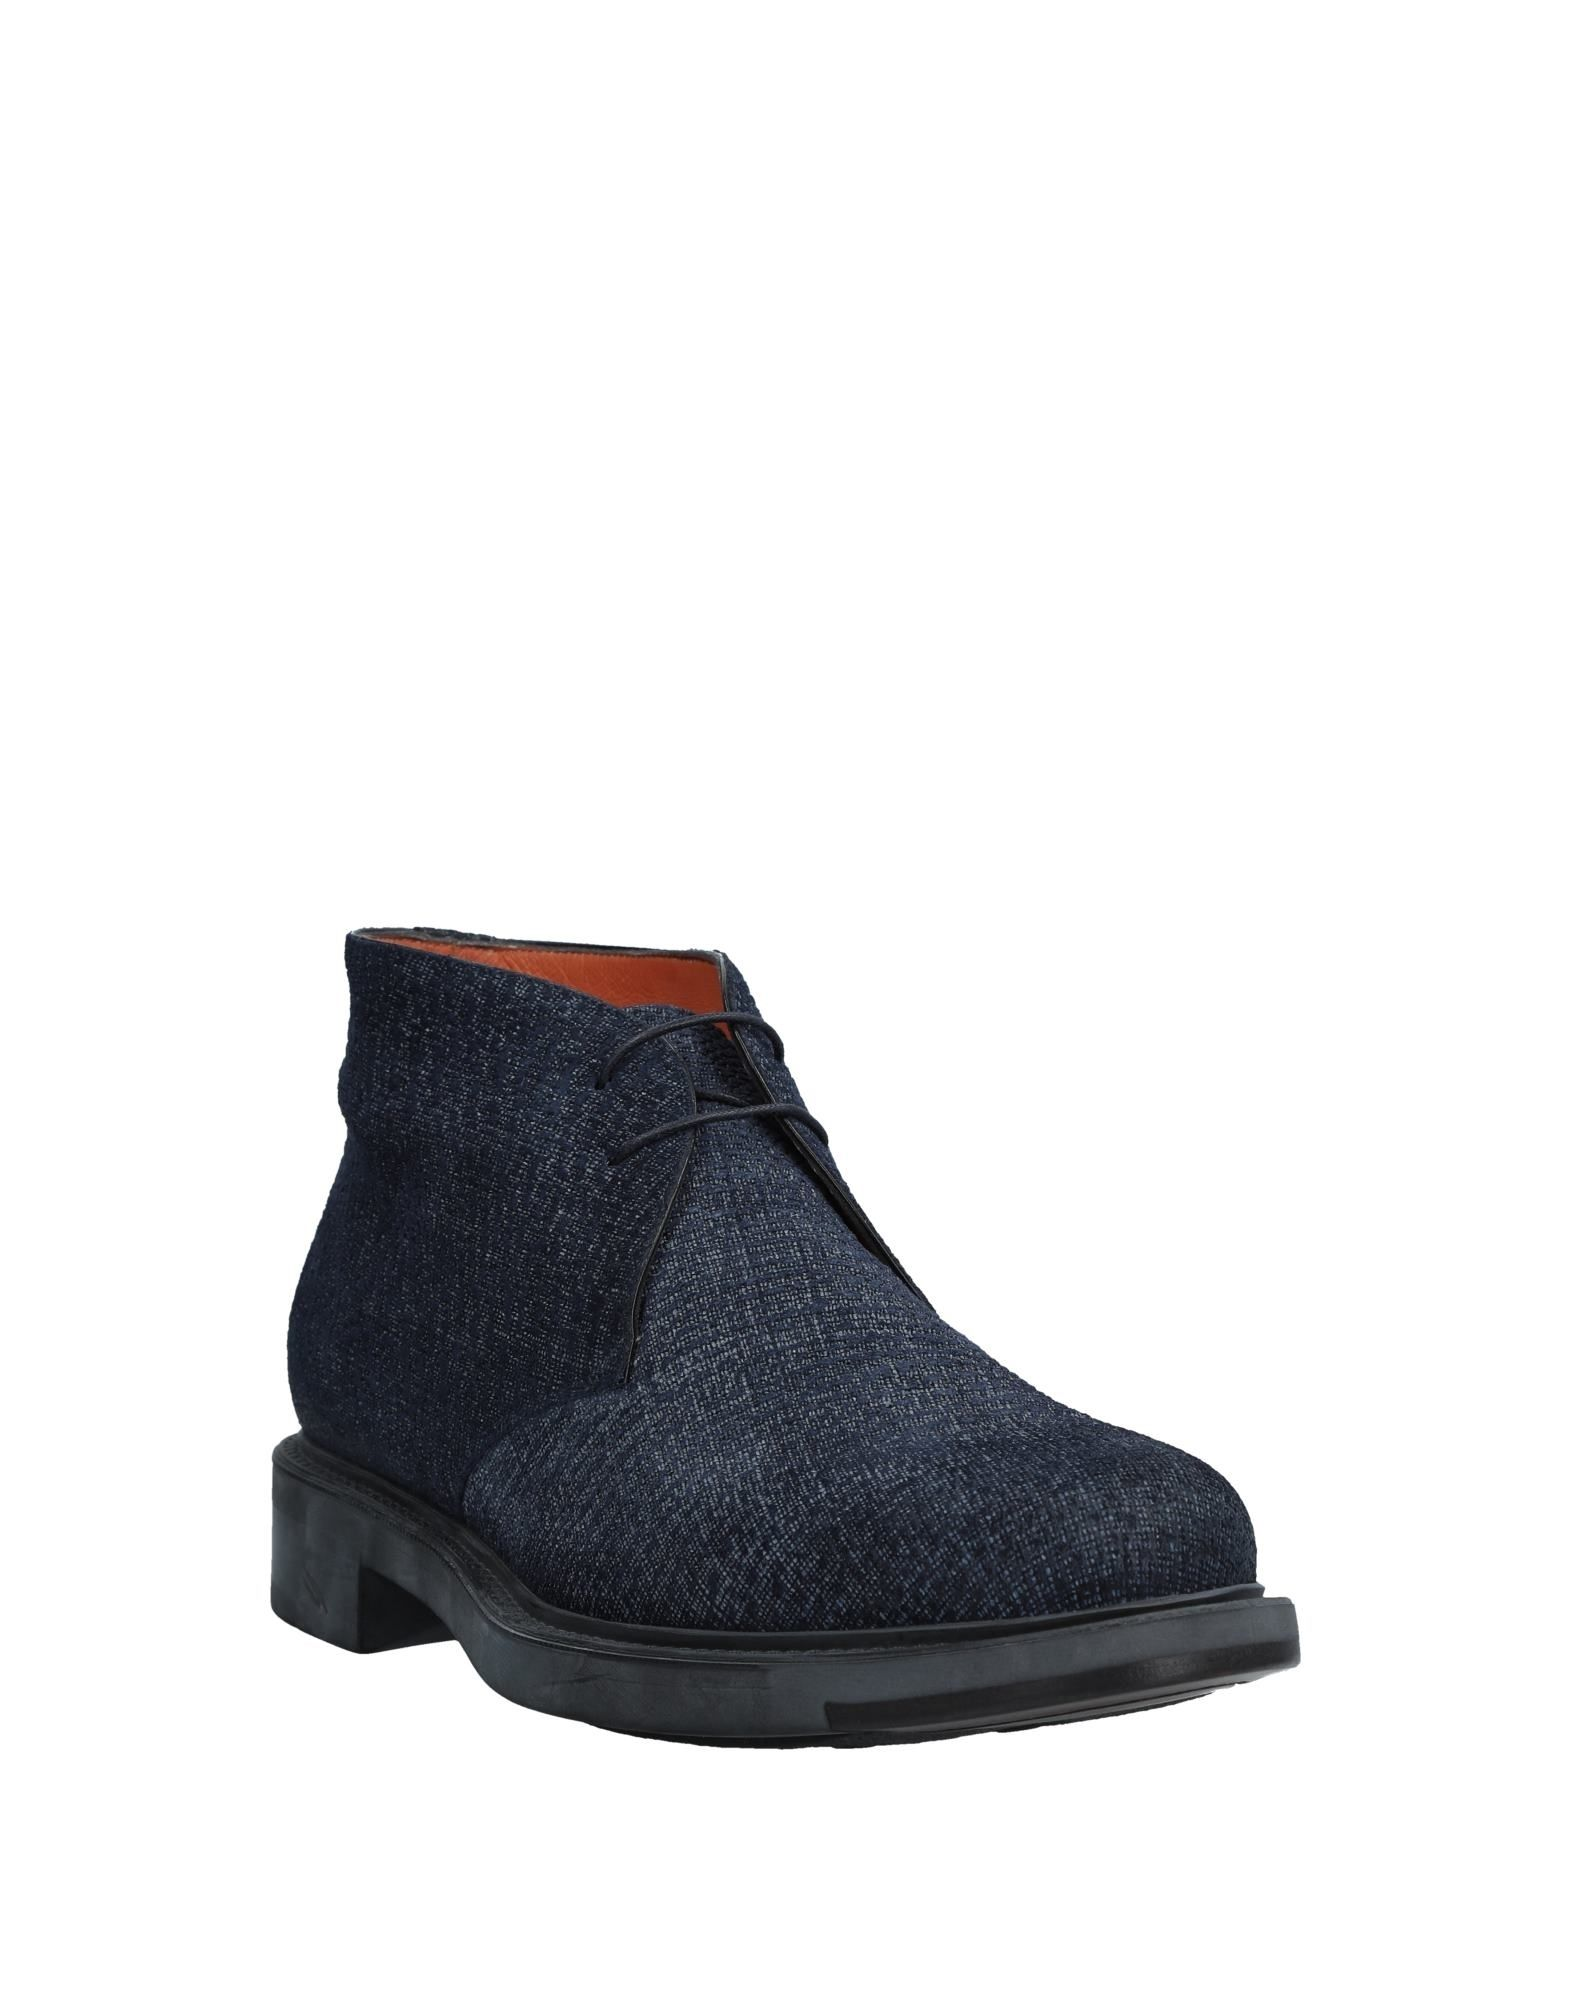 Santoni Stiefelette Herren  11540036IX Schuhe Gute Qualität beliebte Schuhe 11540036IX a04b24